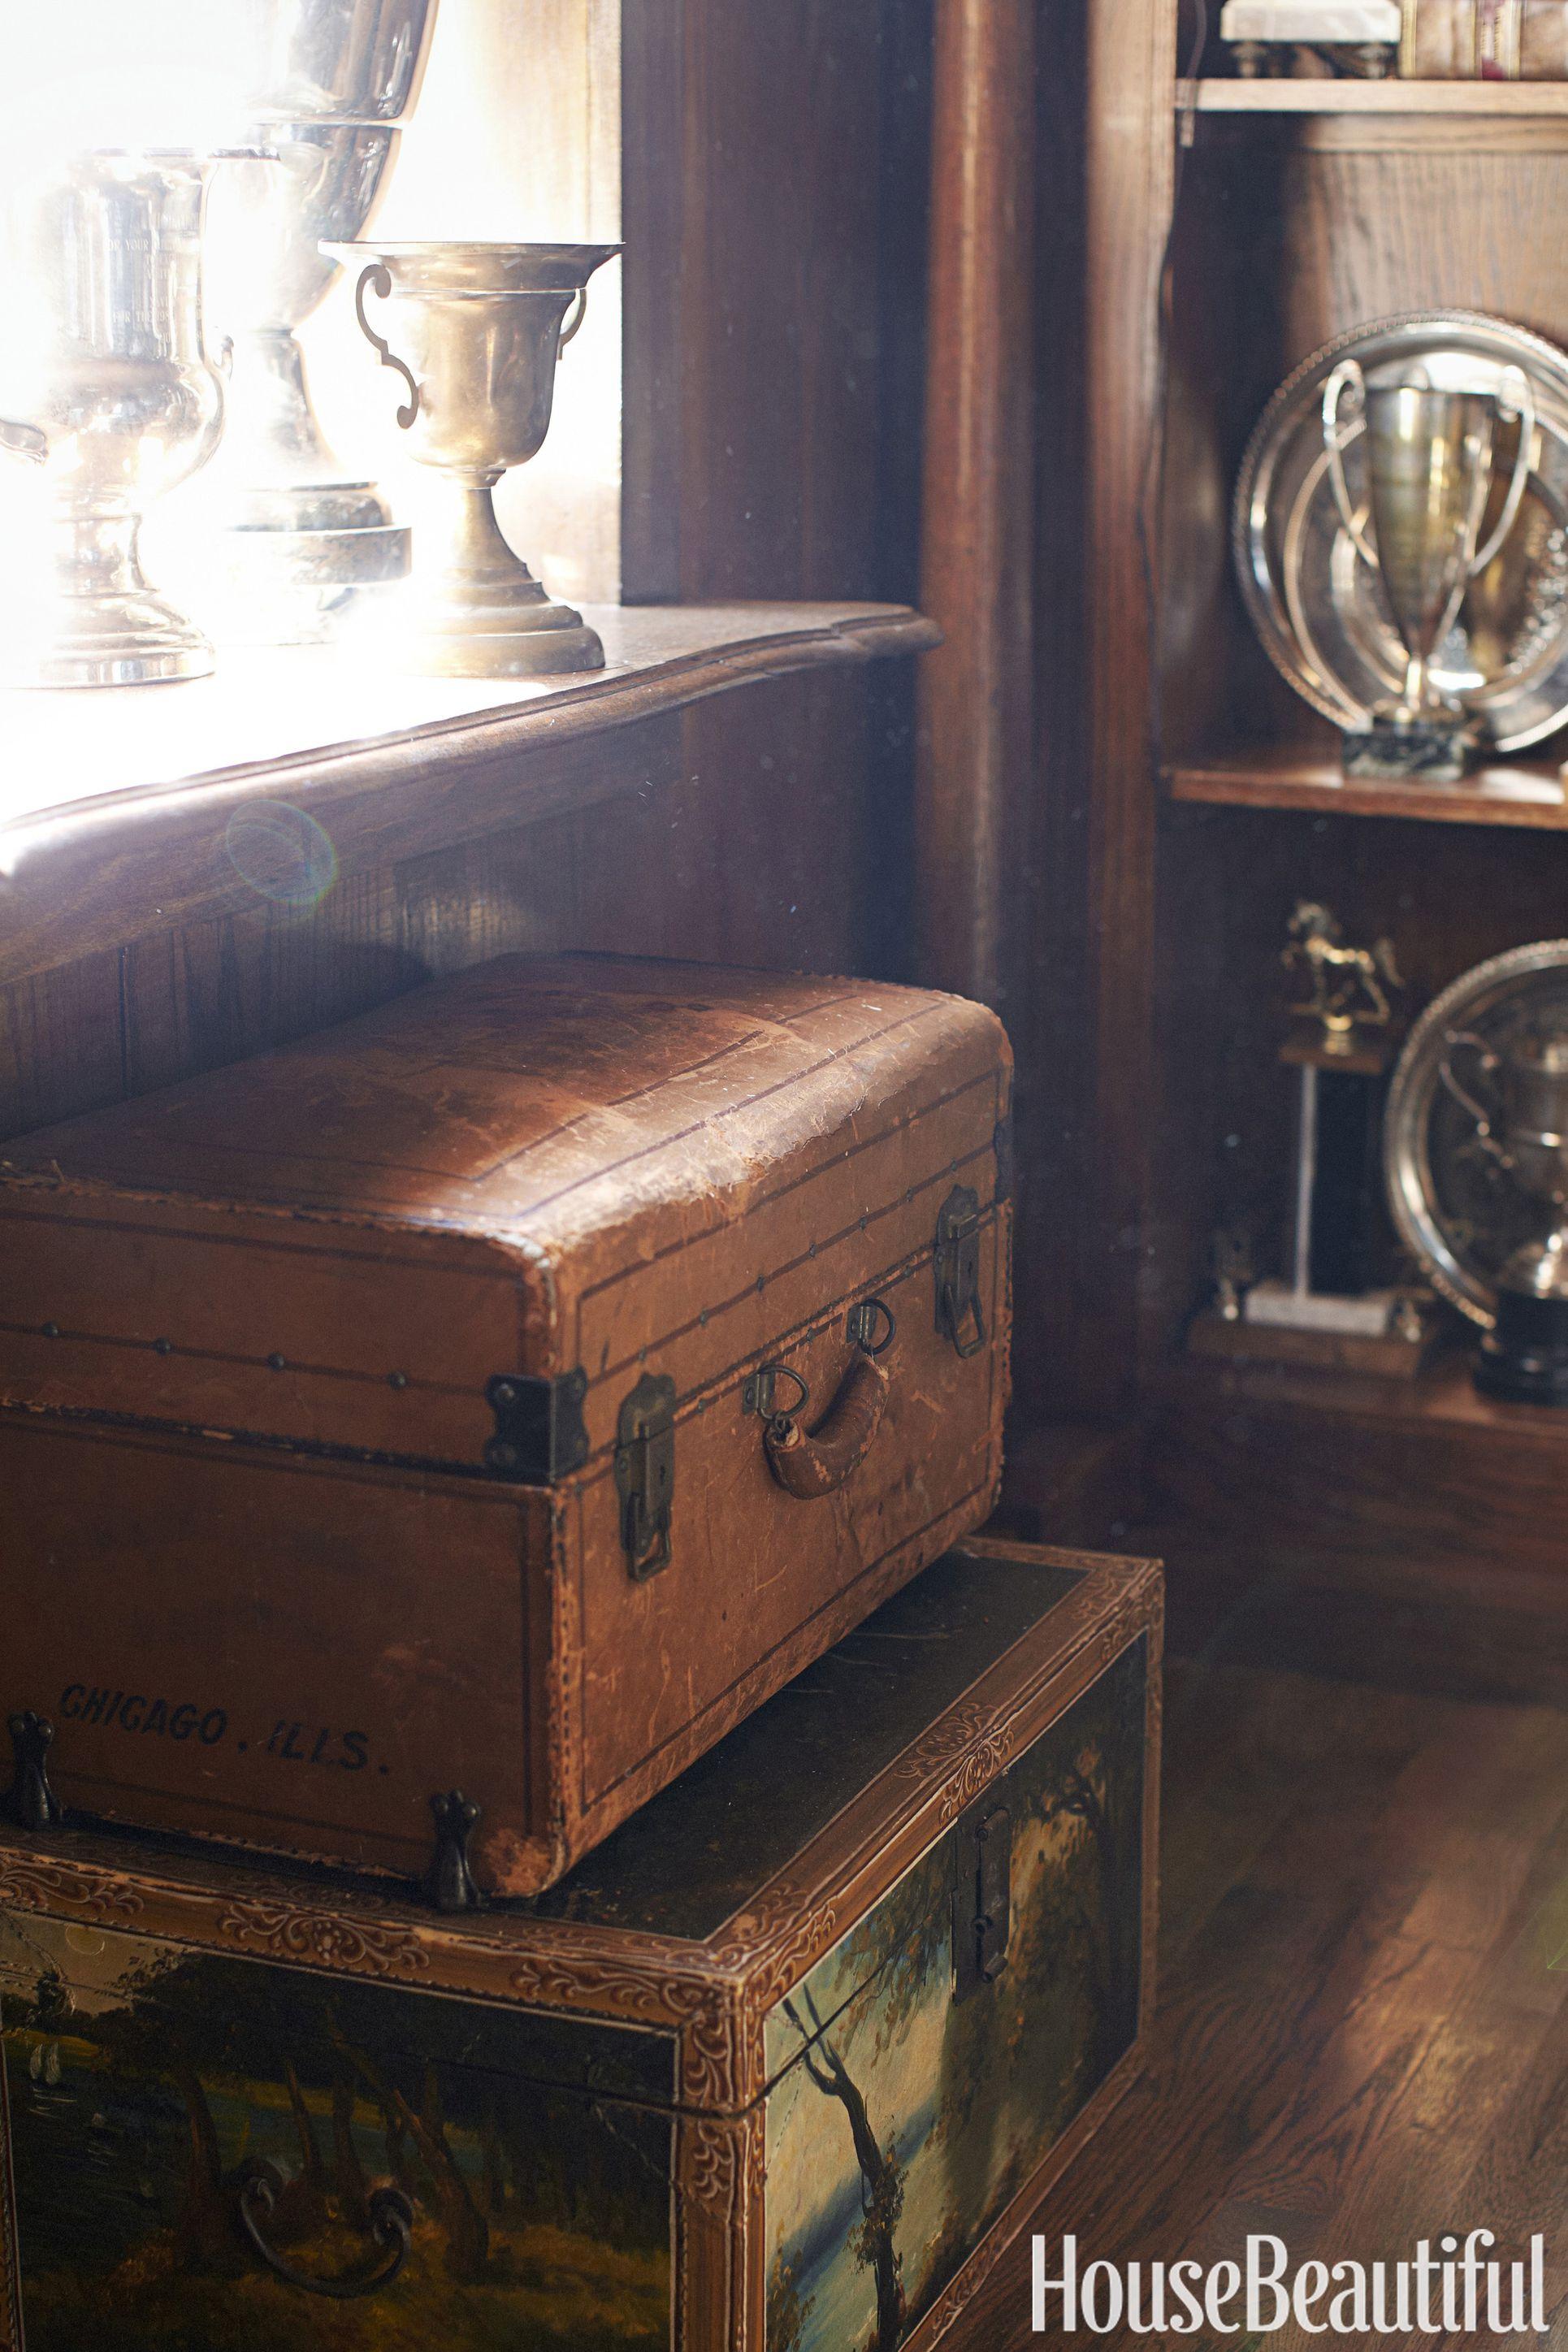 annie-brahler-smith-travel-trunks-0617.jpg